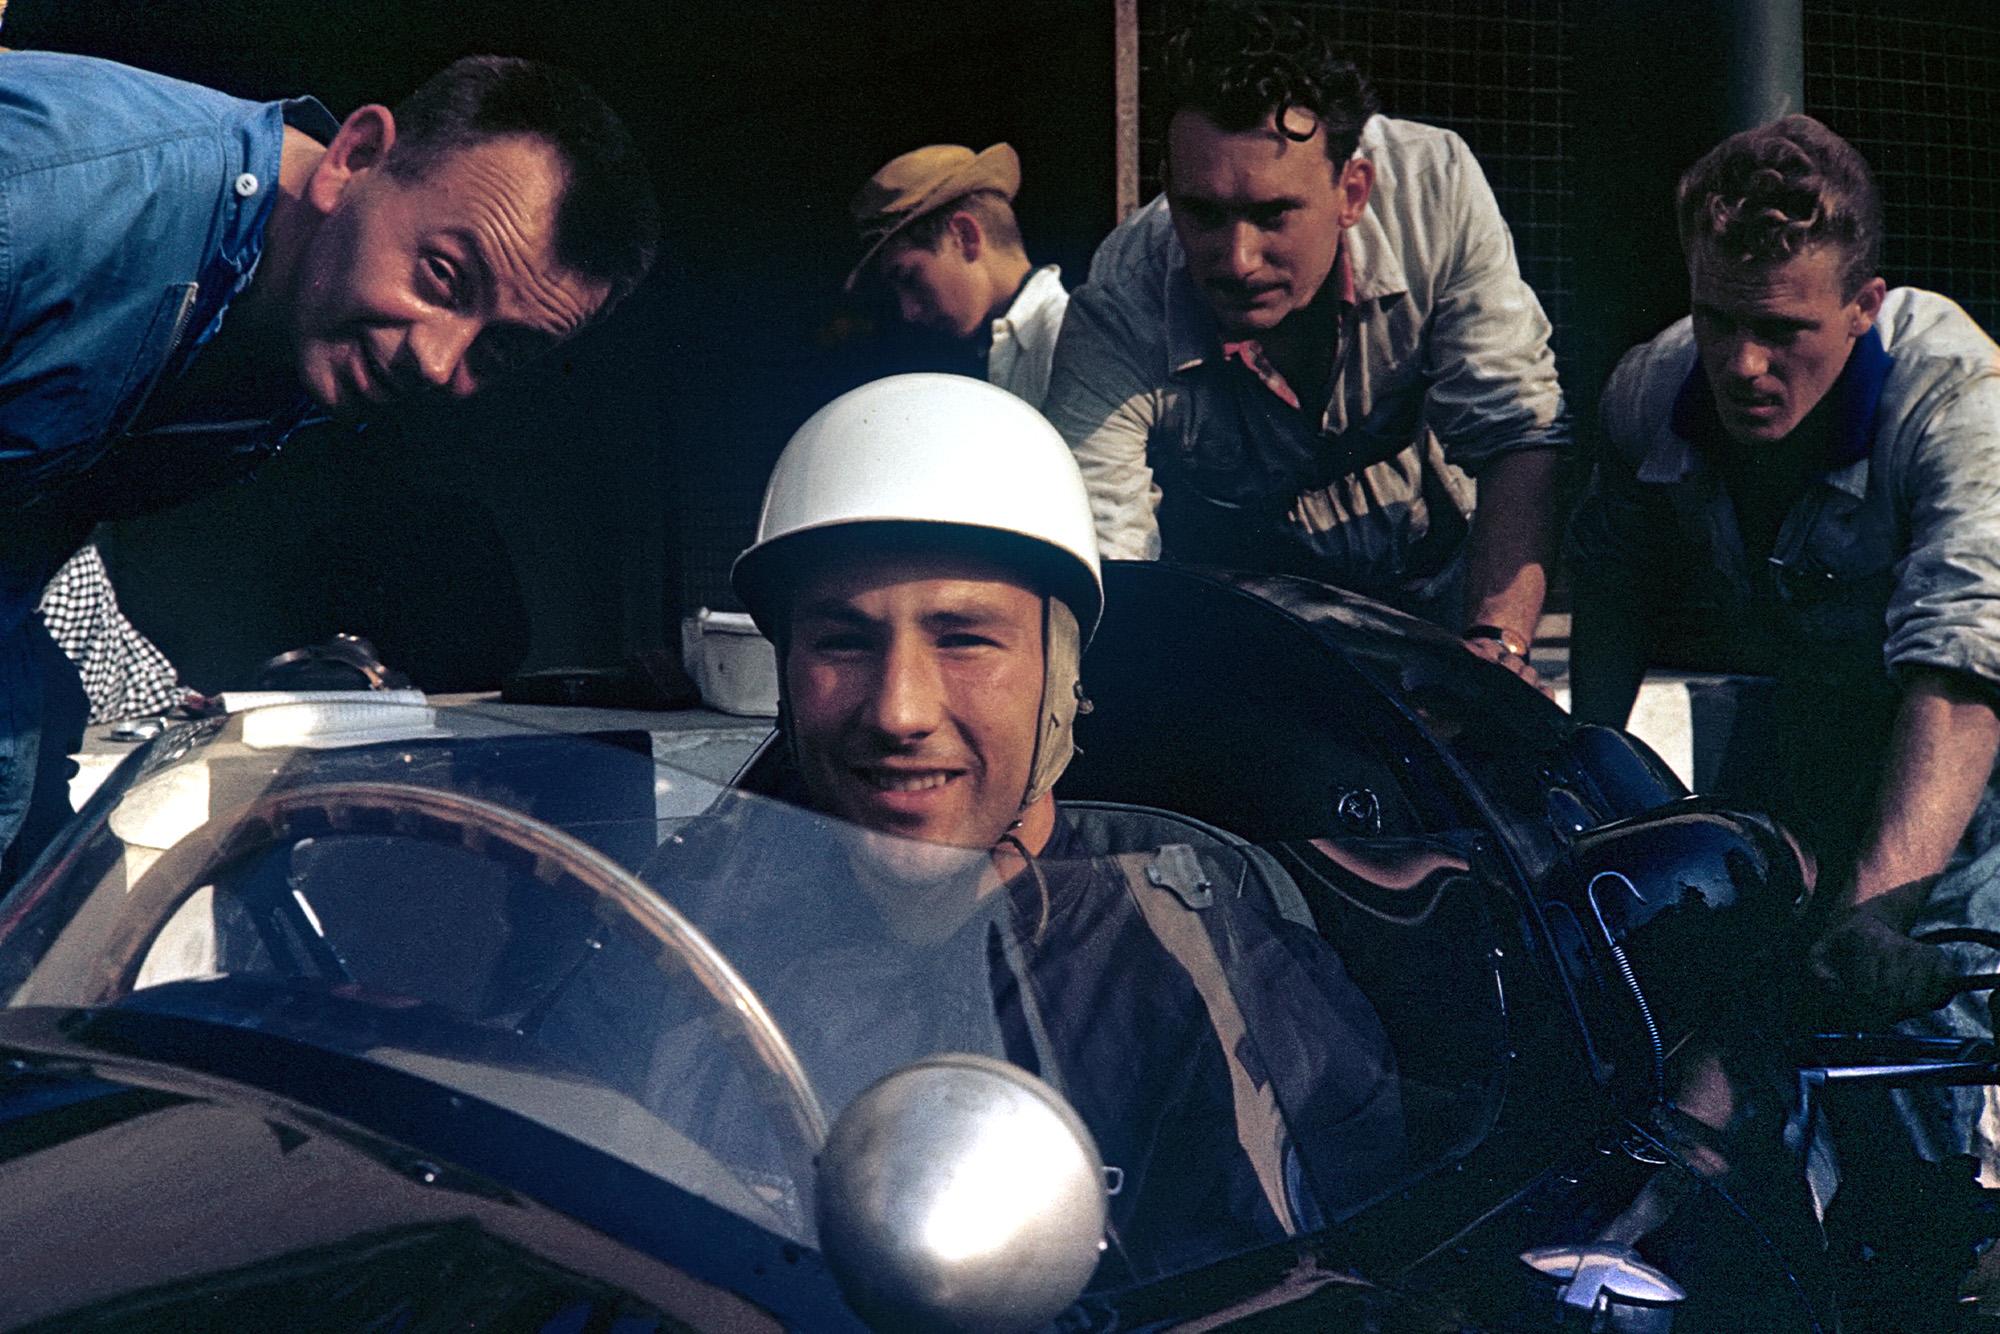 Stirling Moss at the 1959 Dutch Grand Prix